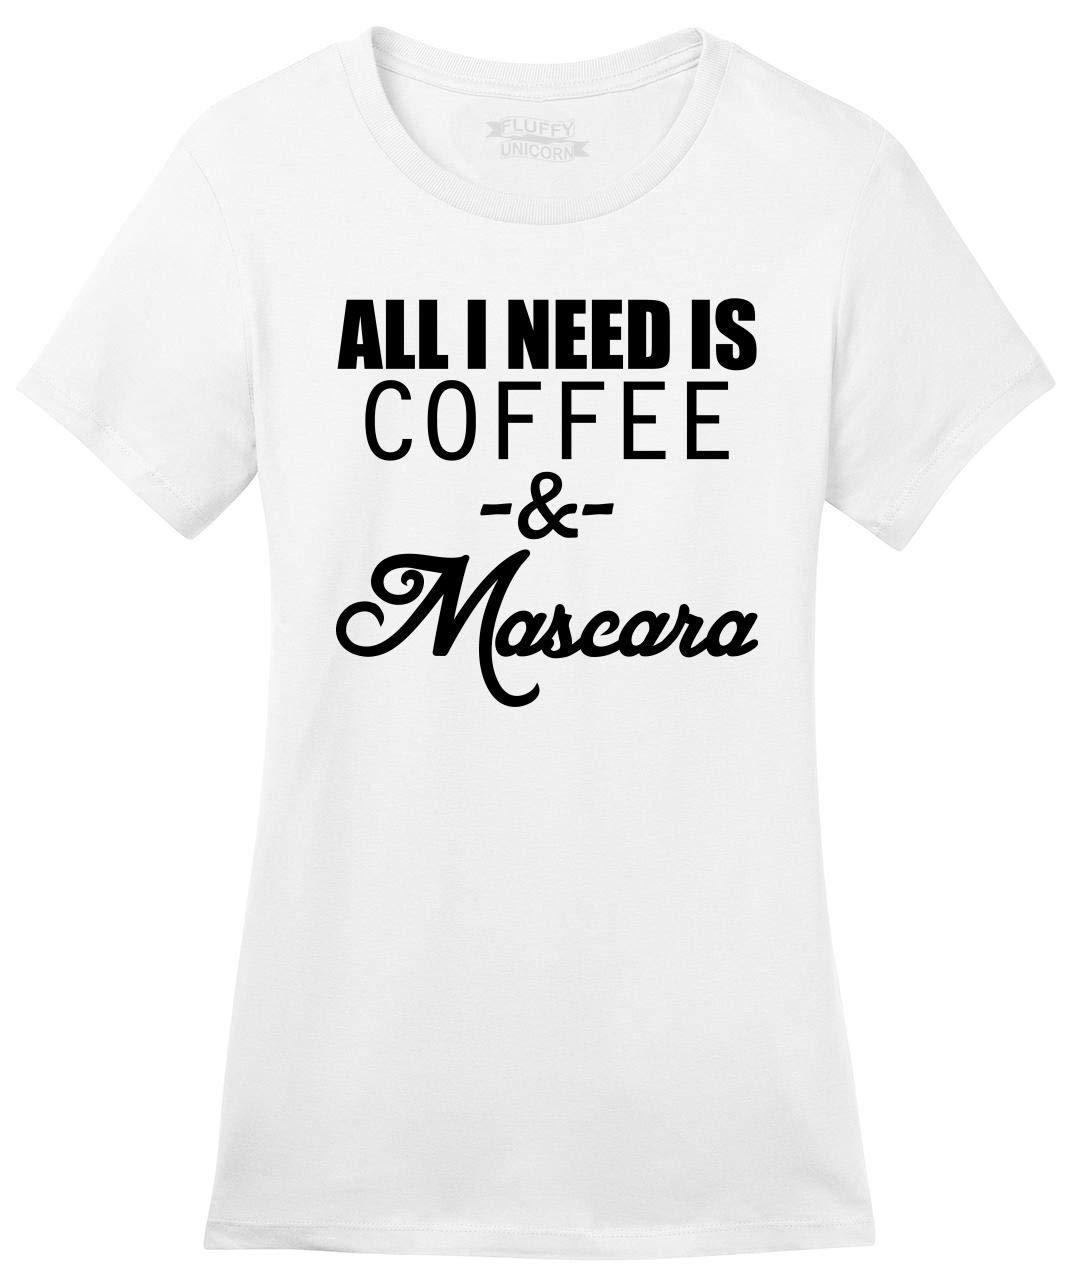 All I Need Is Coffee Mascara Funny T Shirt Soft Tee